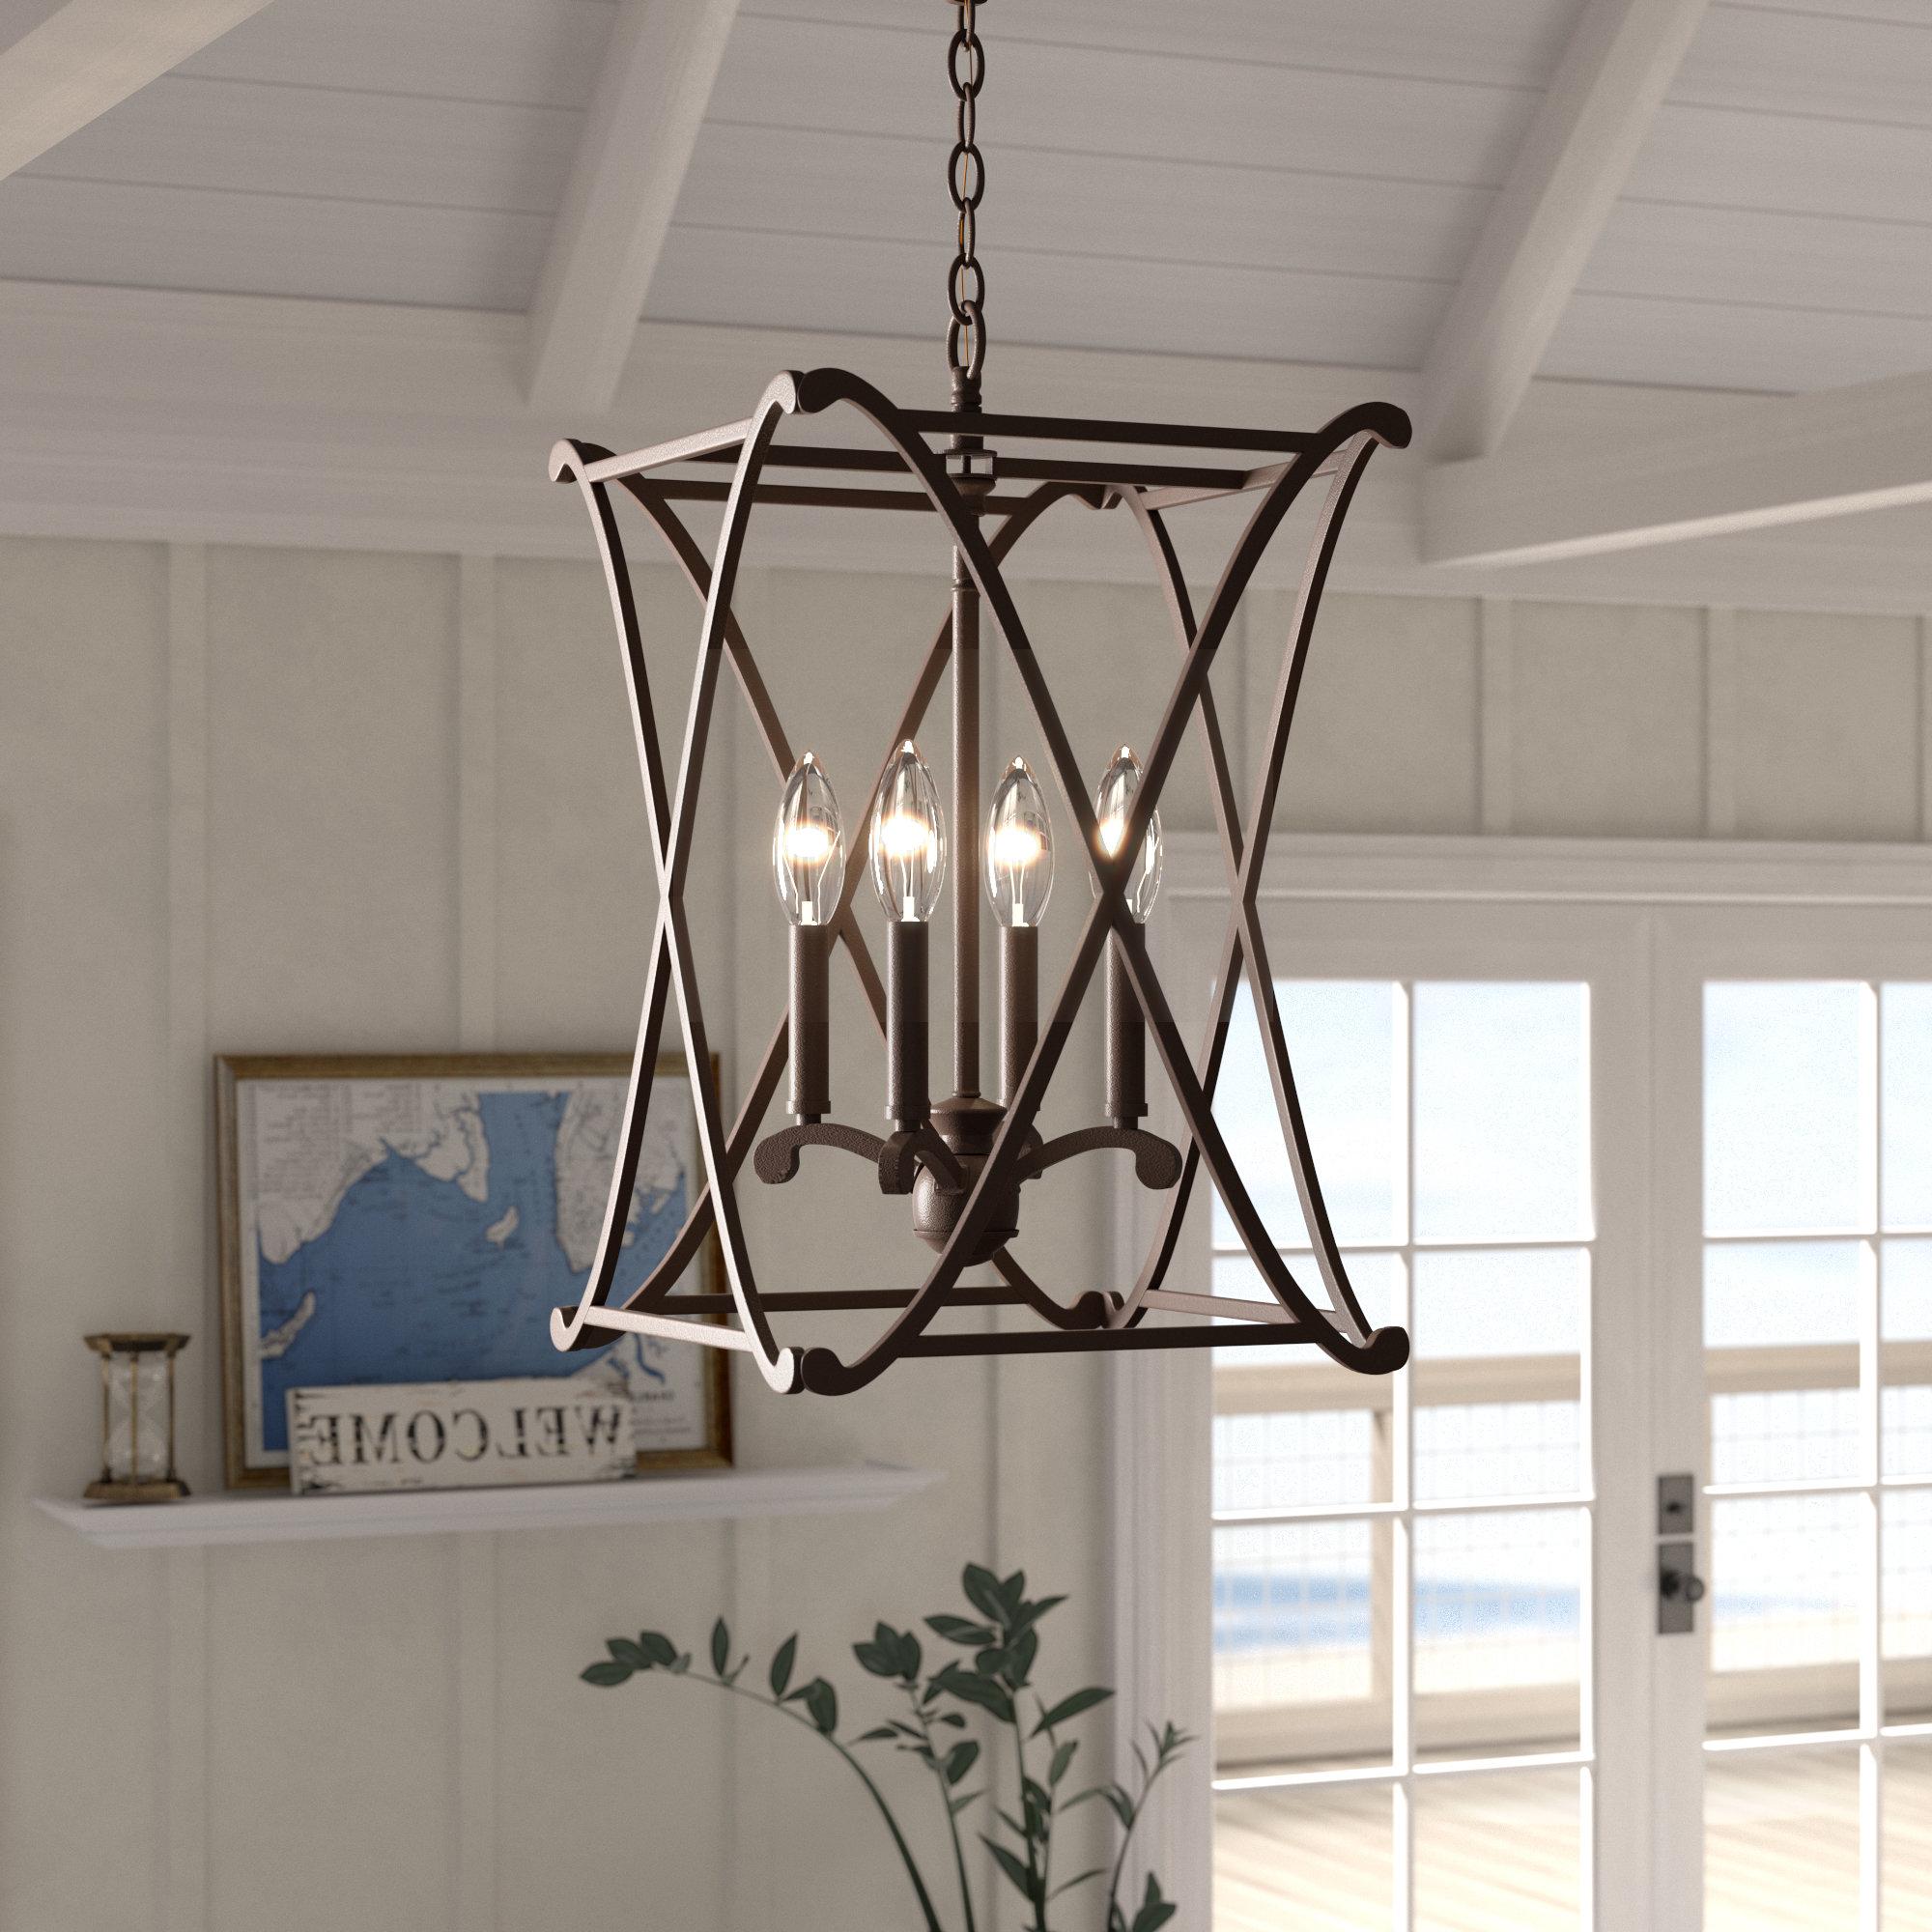 Nisbet 6 Light Lantern Geometric Pendants Throughout Well Known Nisbet 4 Light Lantern Geometric Pendant (Gallery 2 of 20)